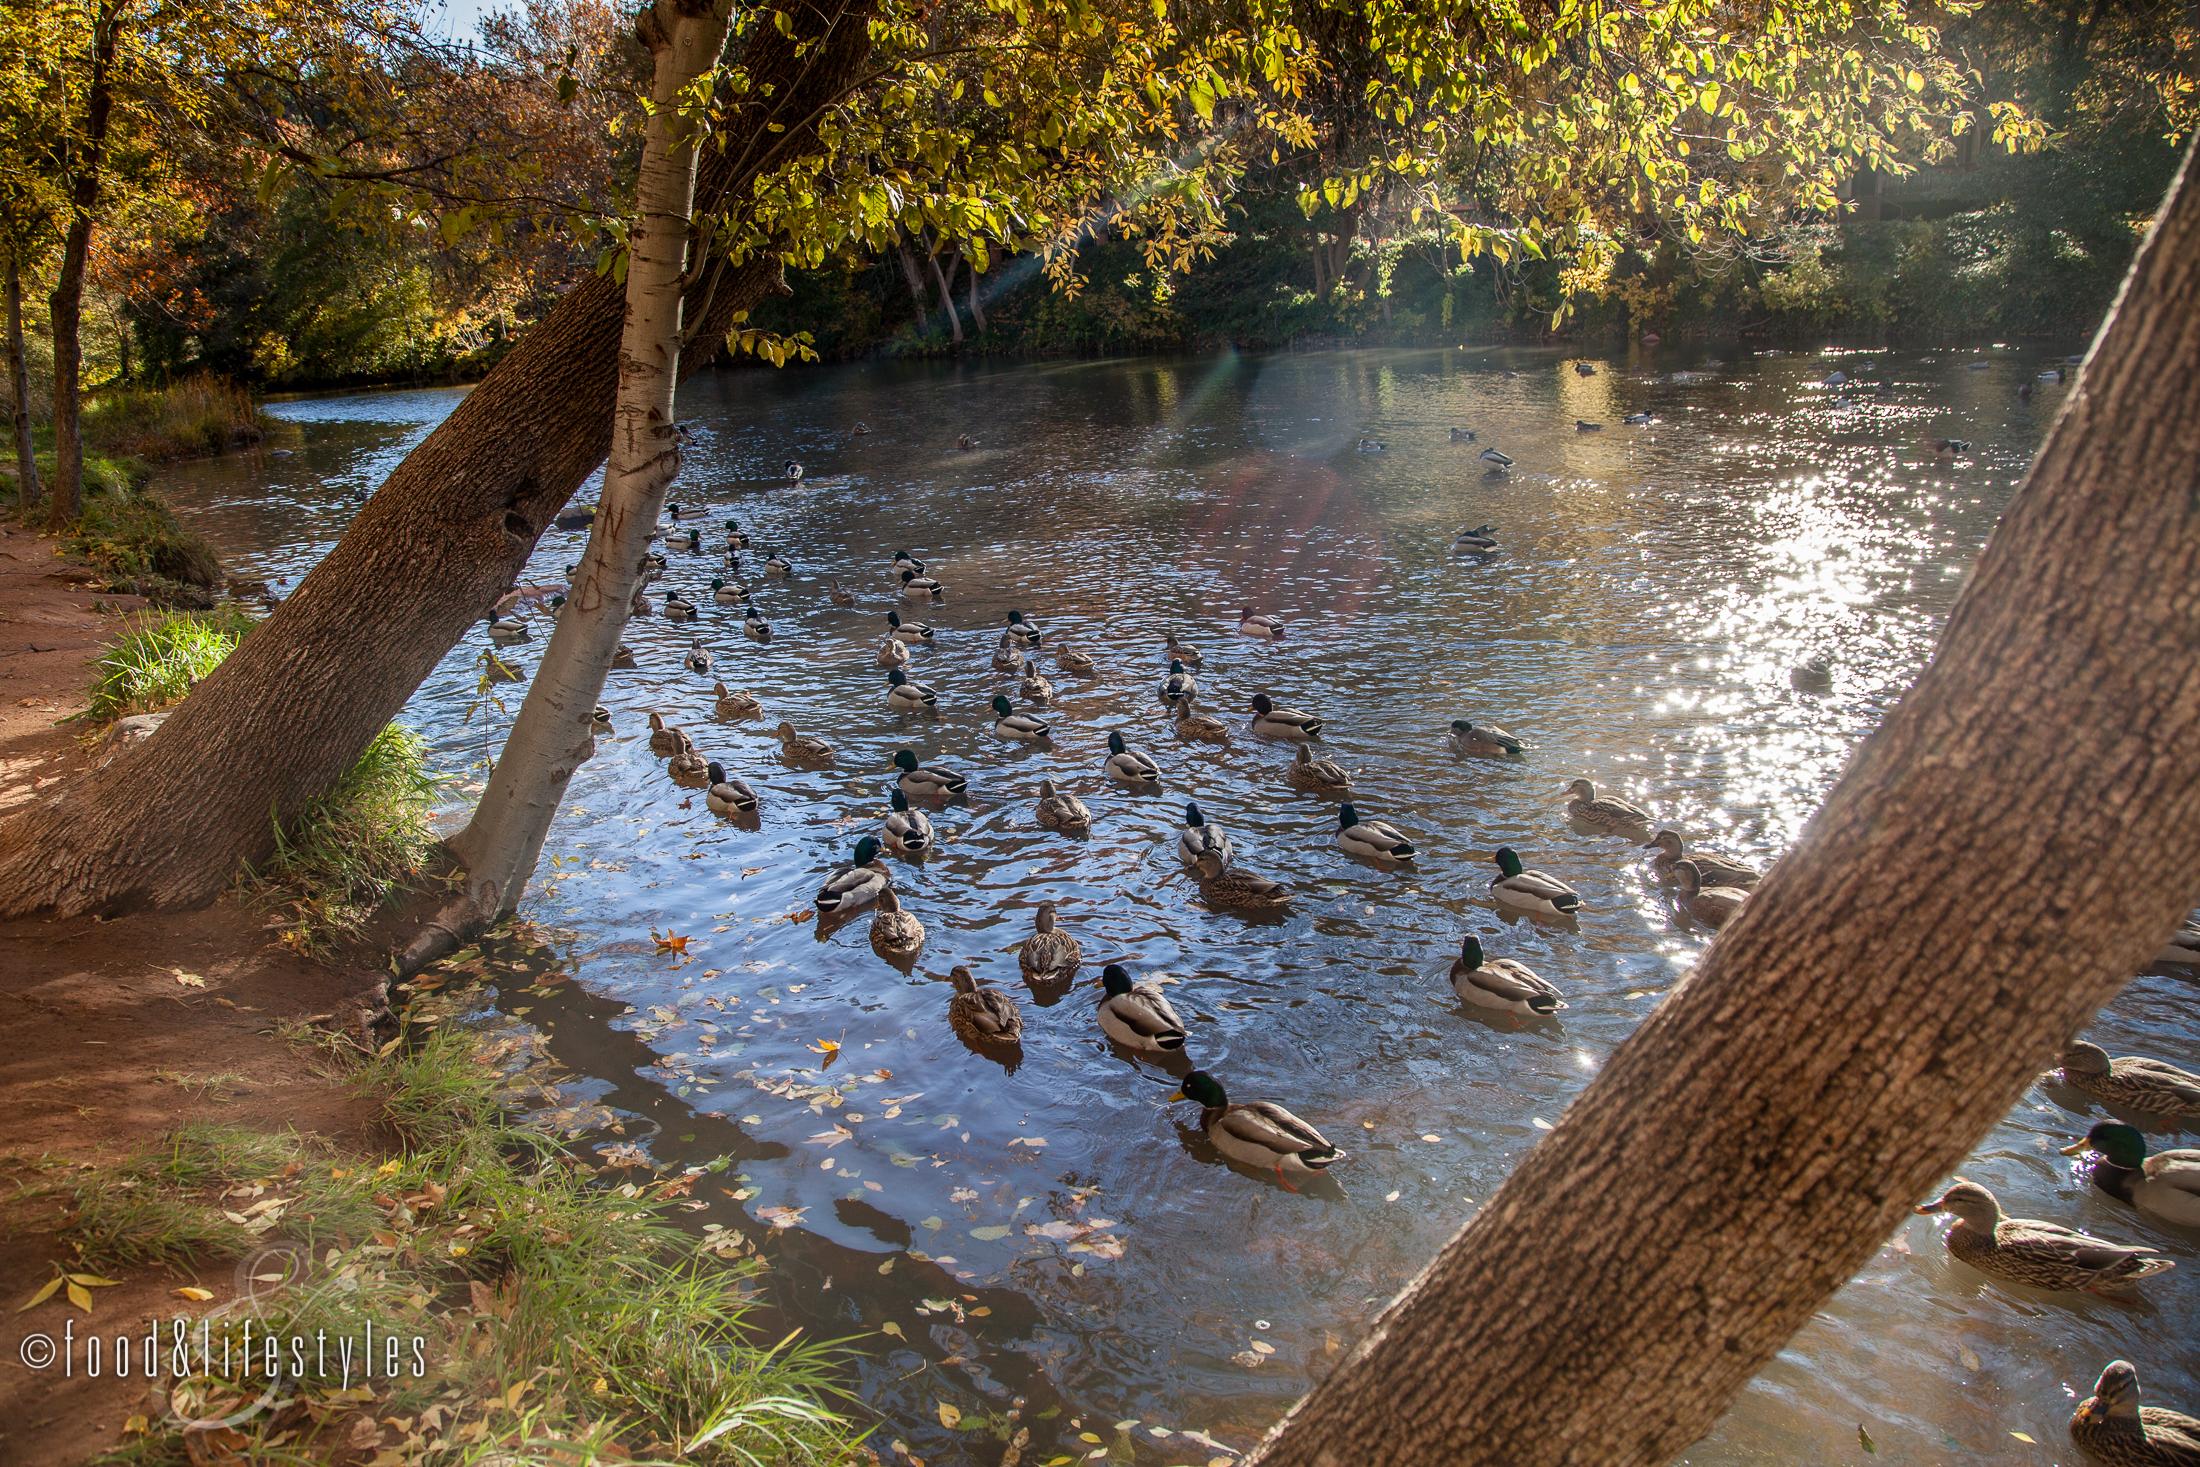 L'auberge de Sedona duck beach